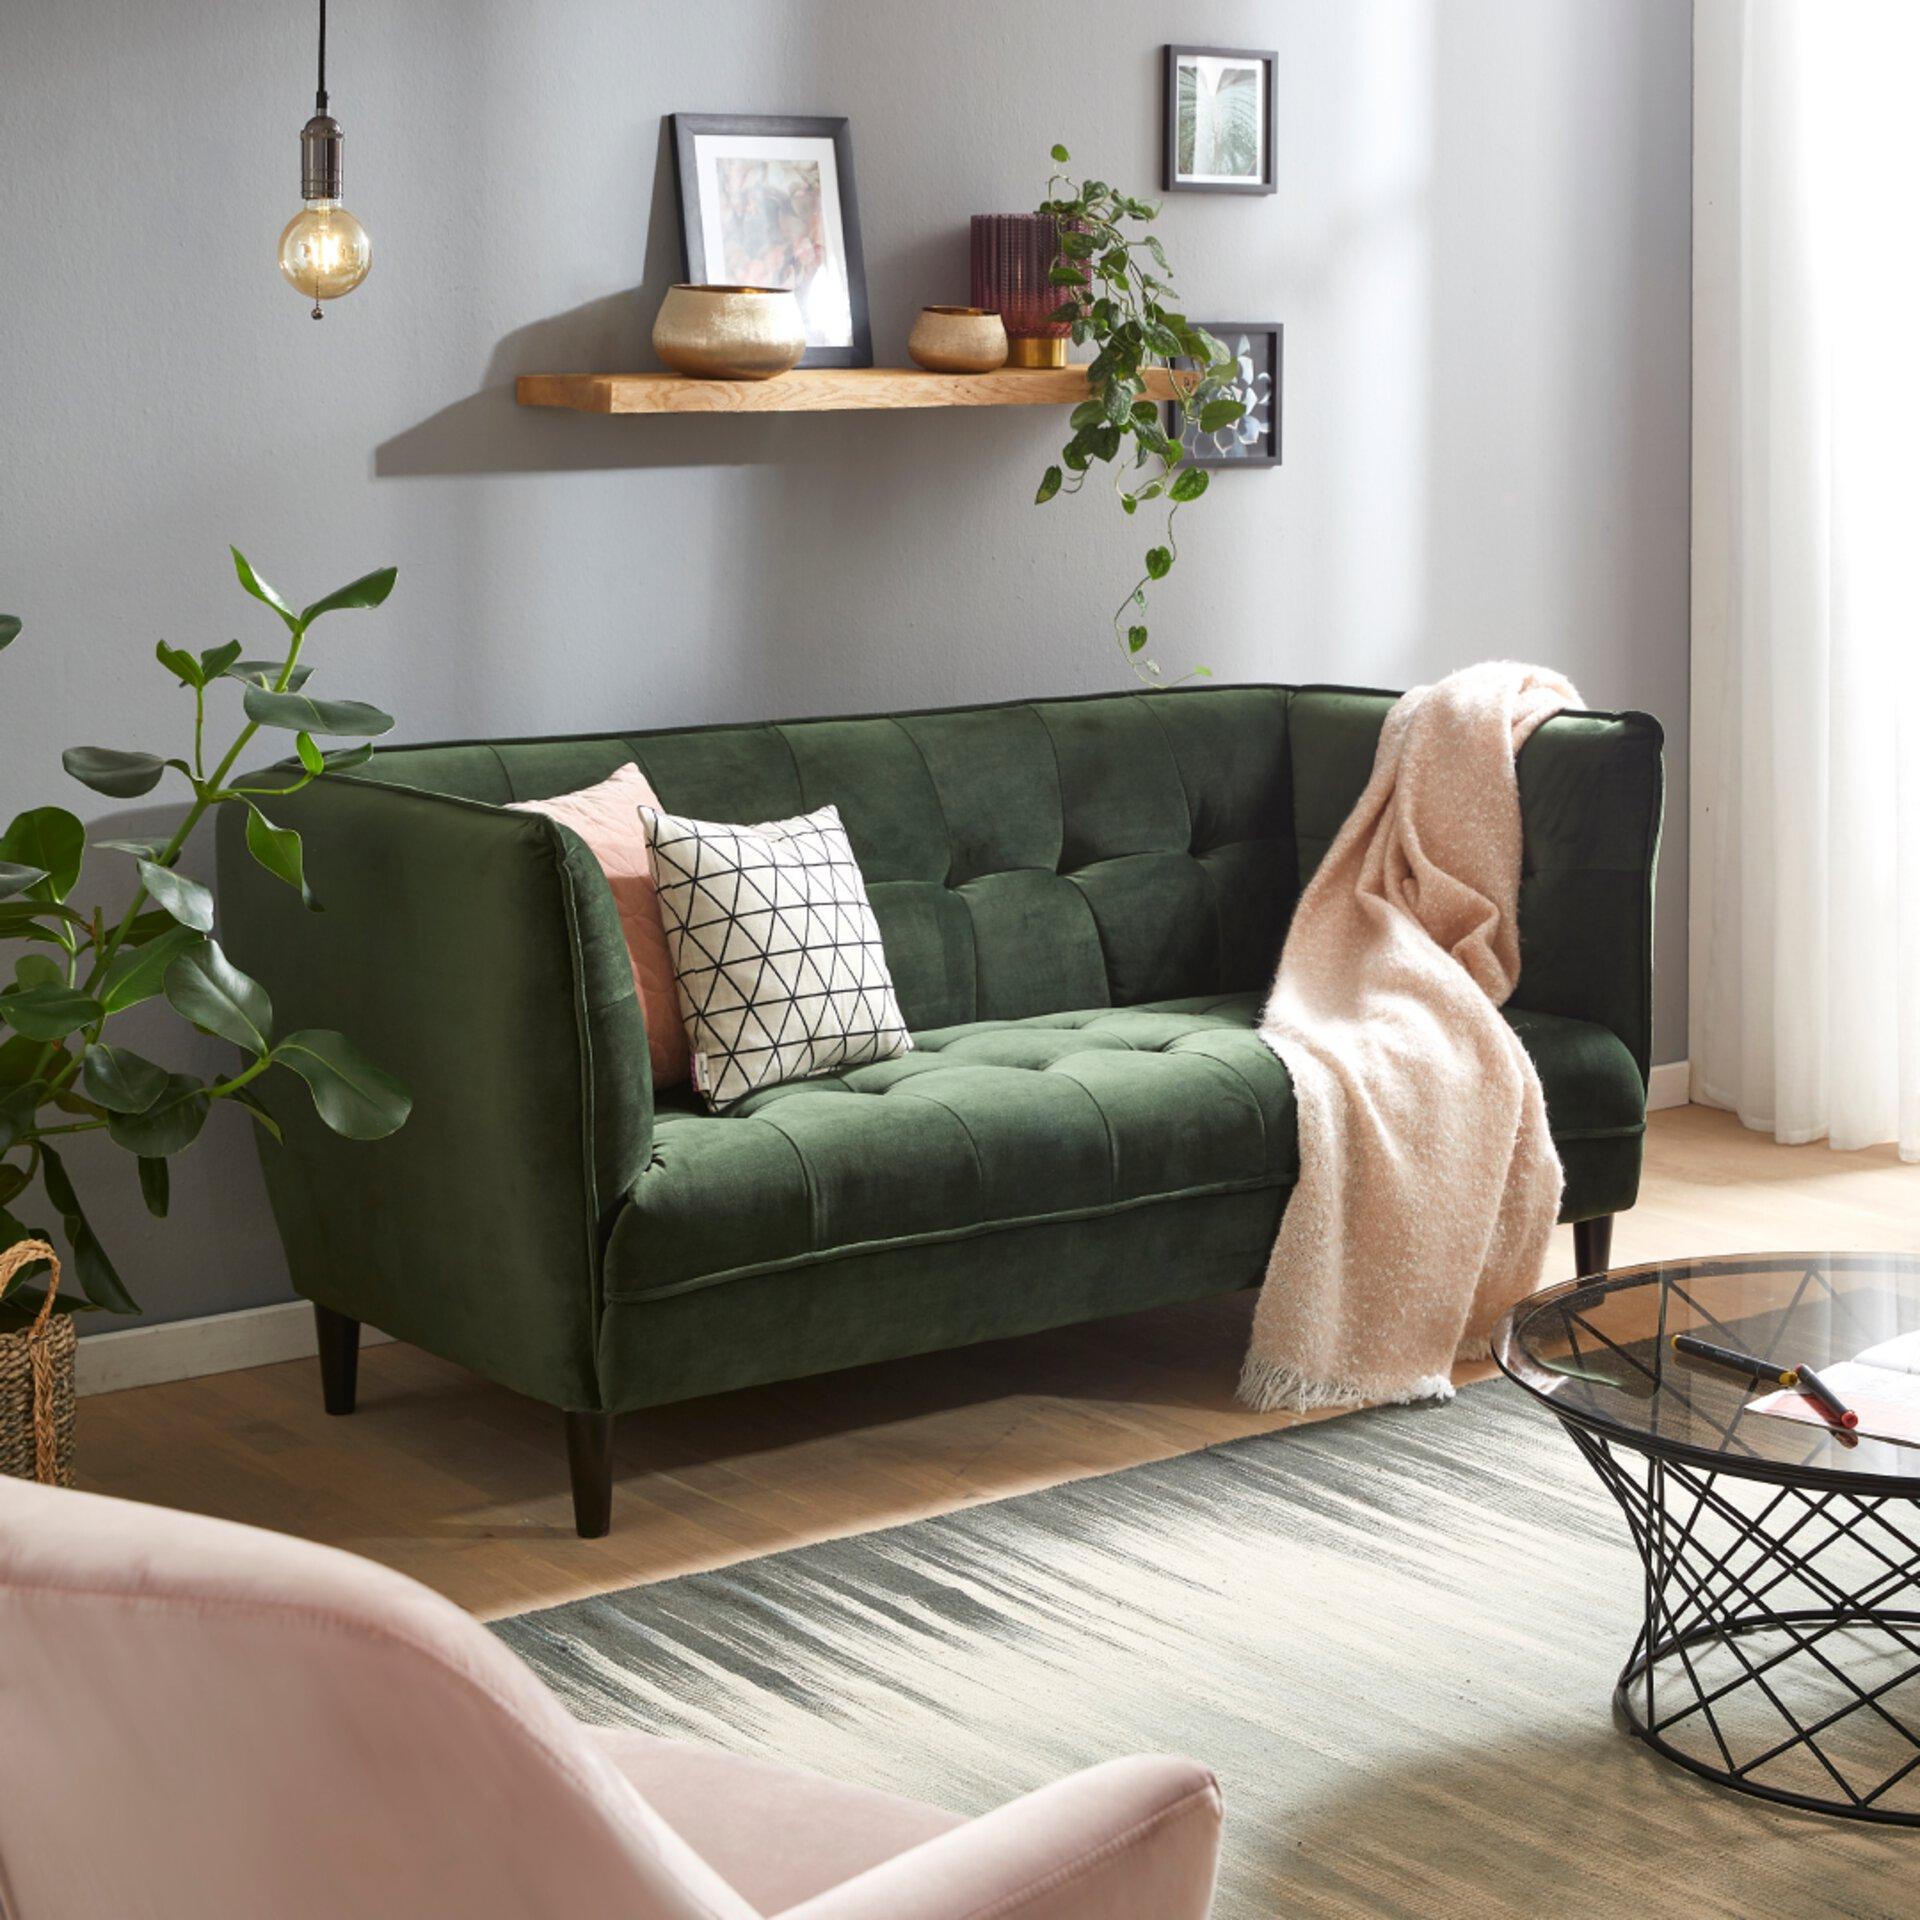 Sofa Jonna aus Stoff von Actona